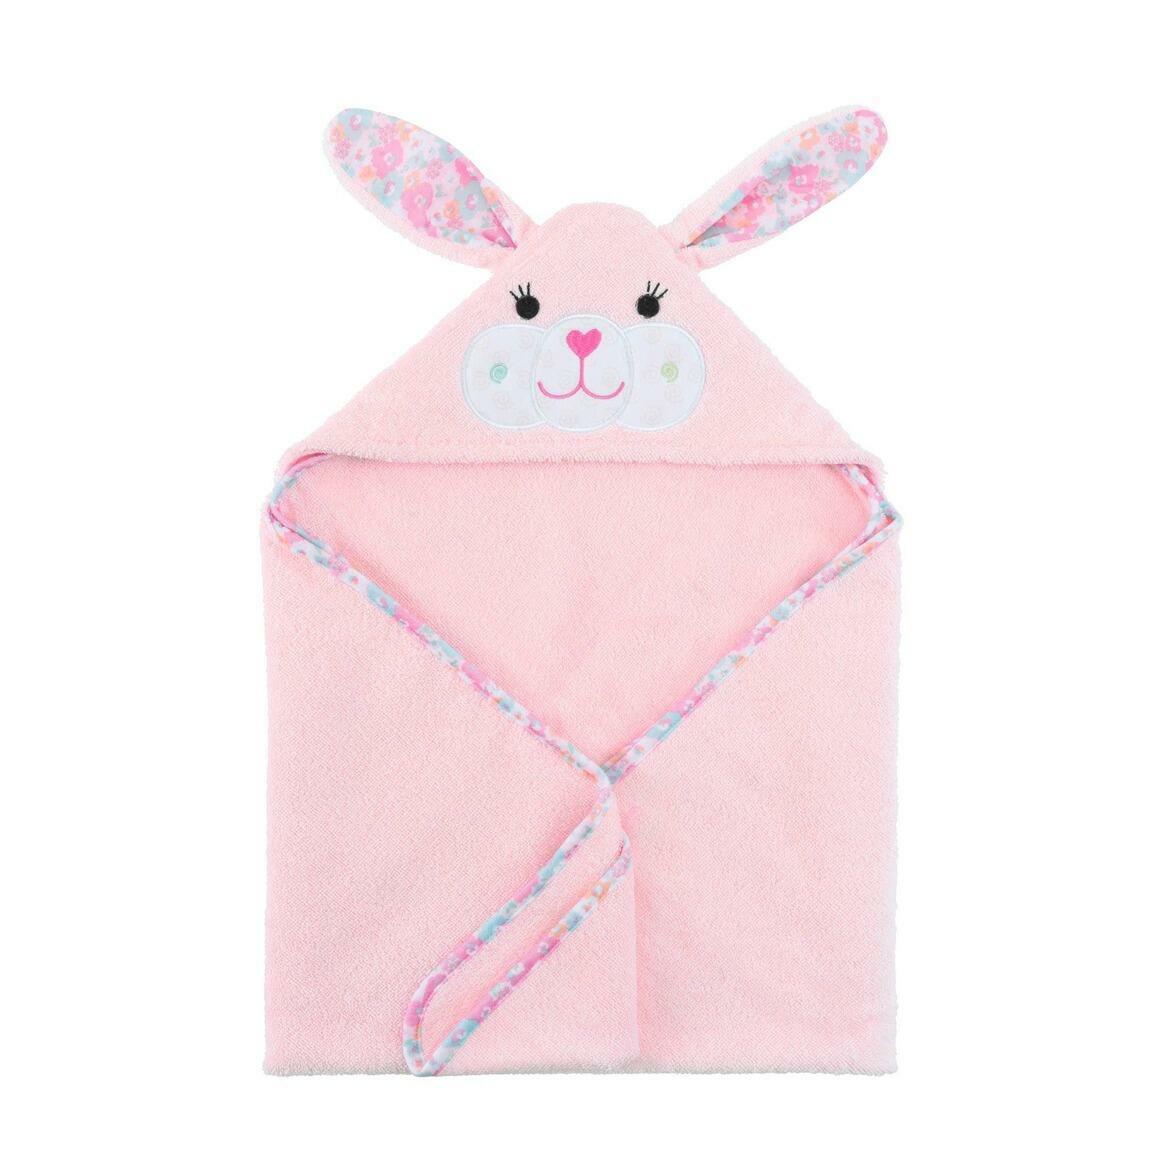 Beatrice the Bunny Baby Towel | Trada Marketplace